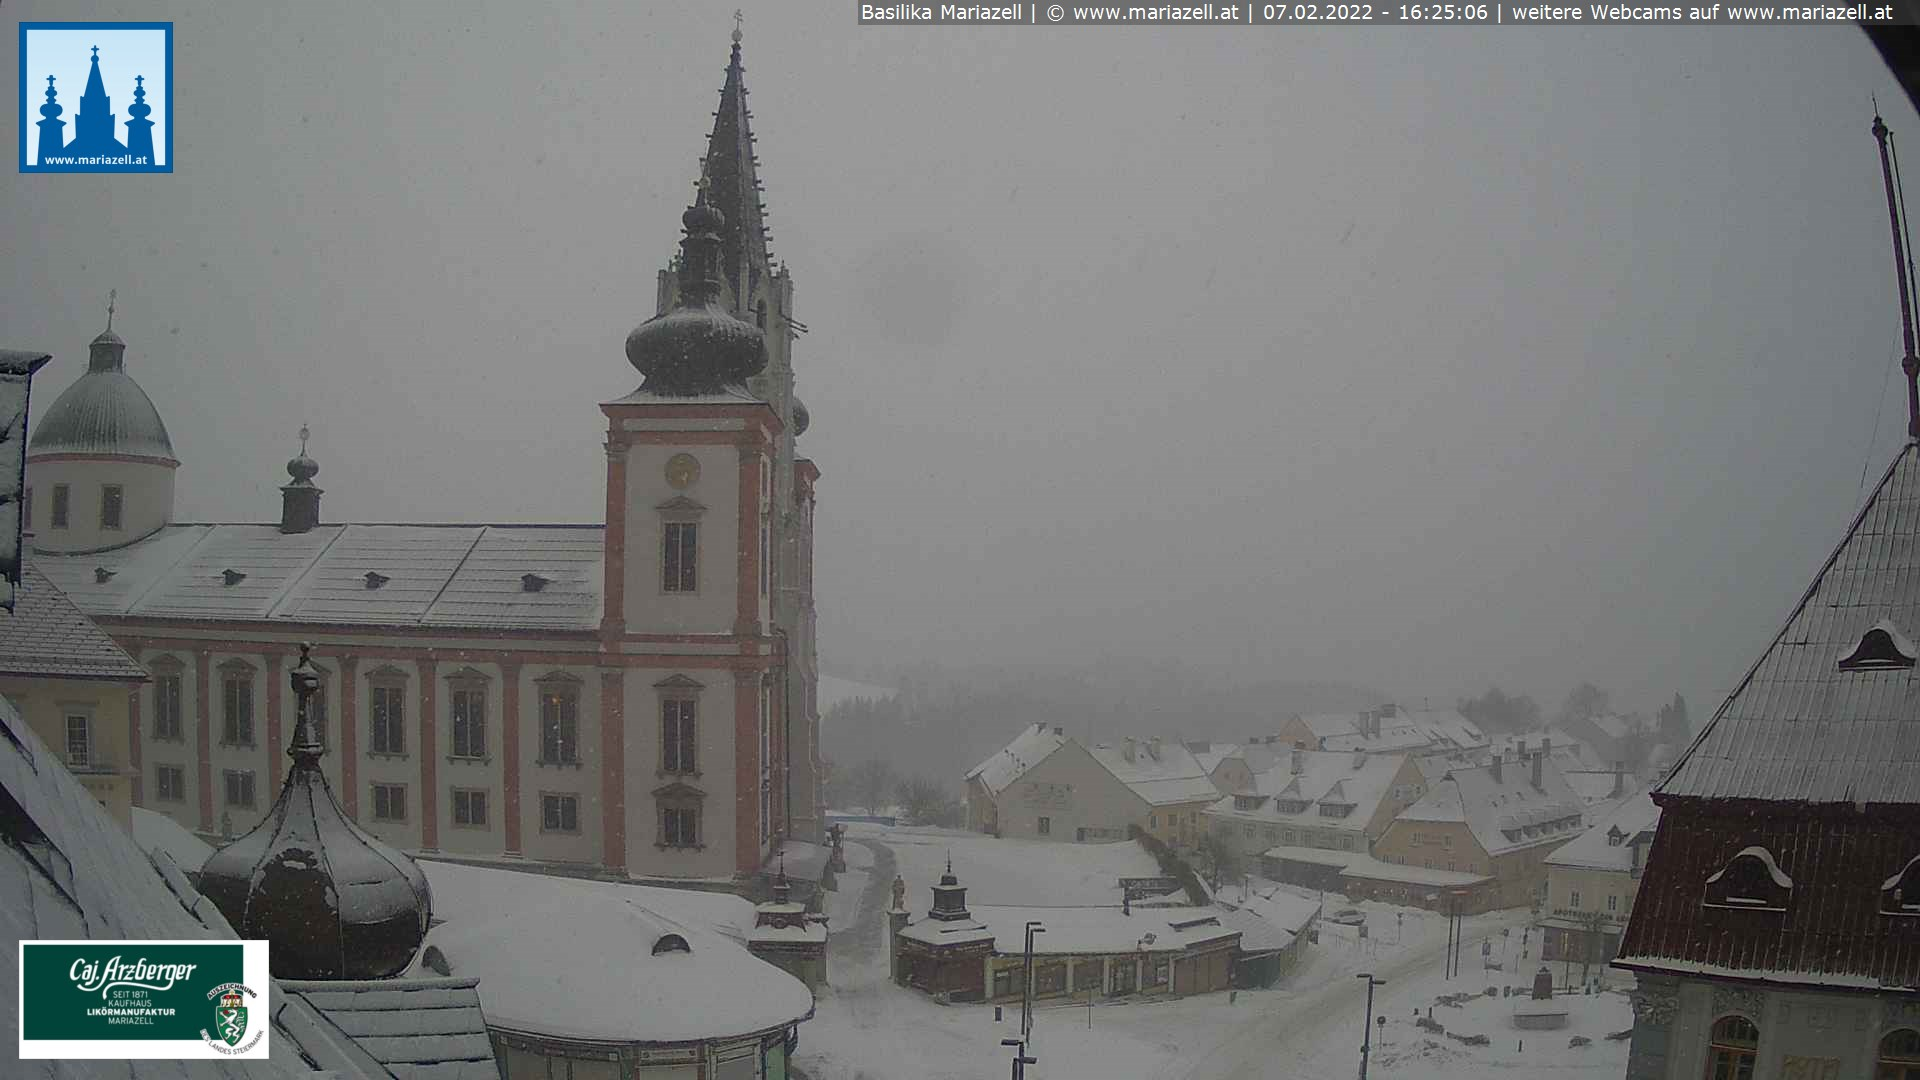 Mariazell, Basilika / Österreich